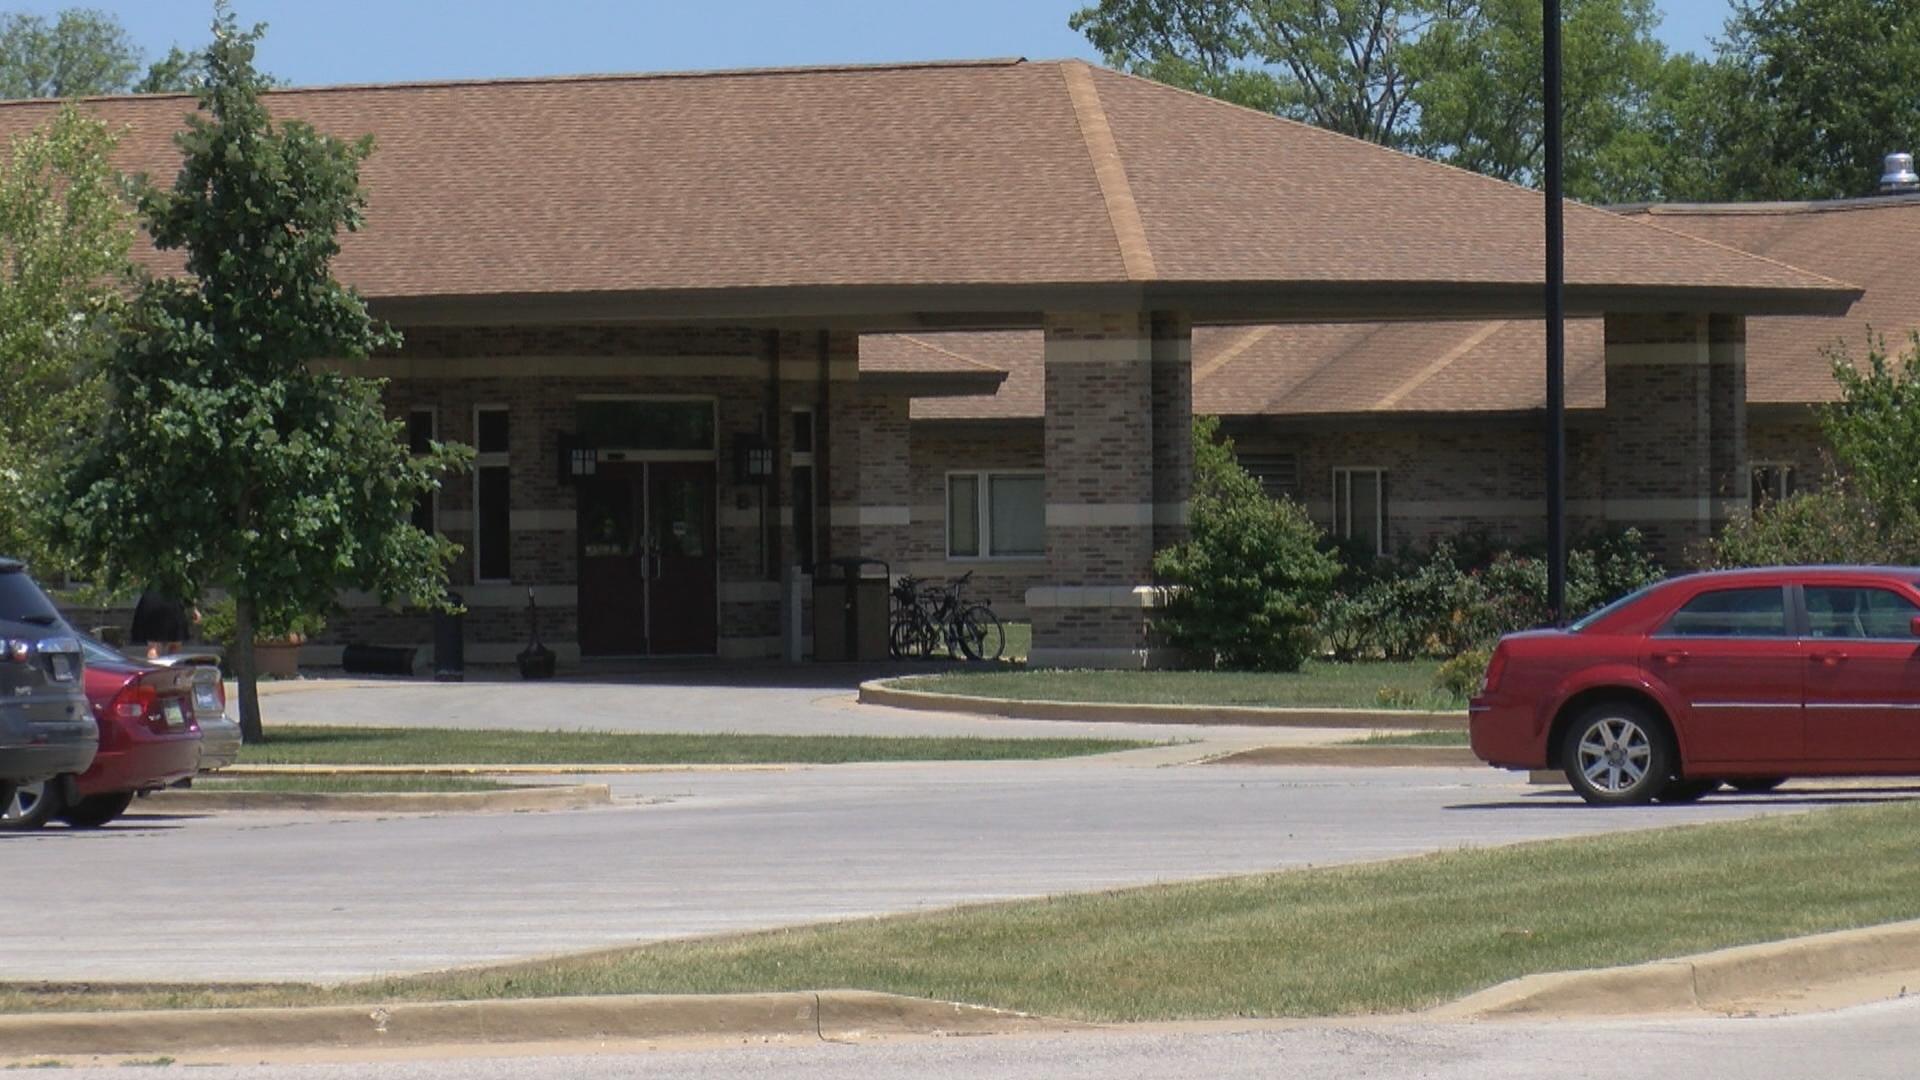 champaign county nursing home_1501105760656.jpg